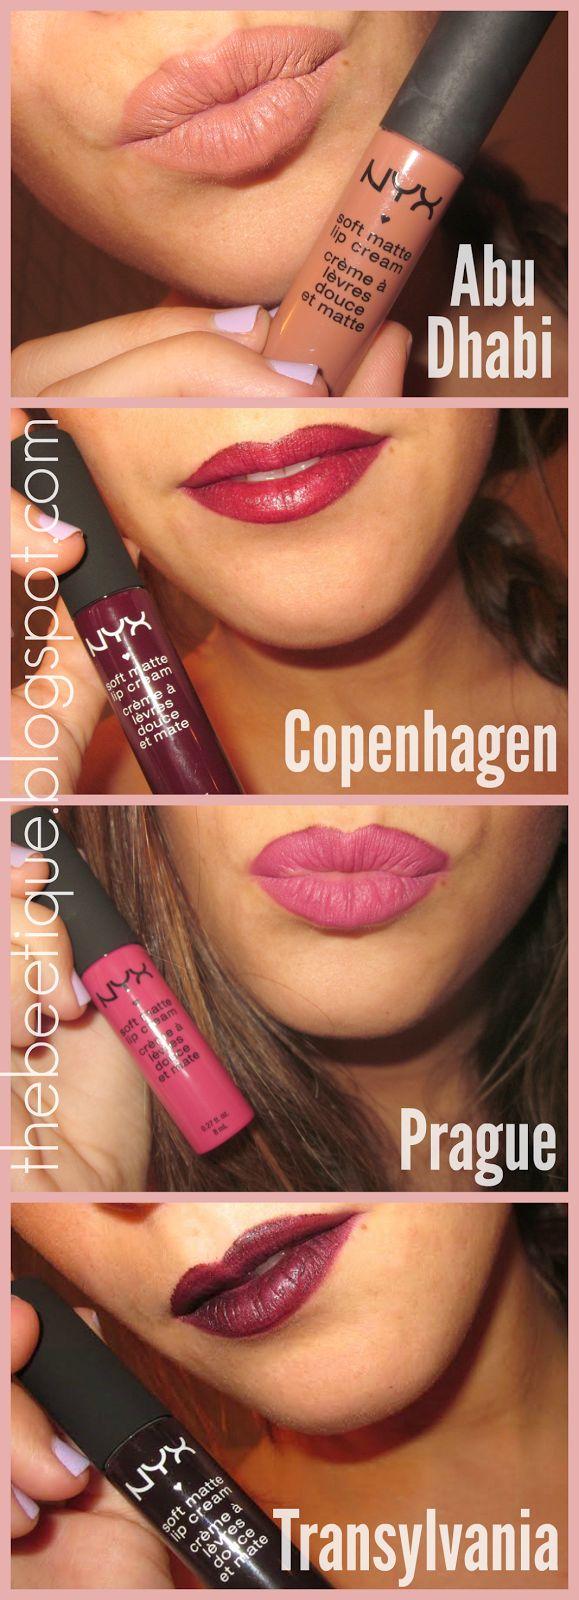 NYX Soft Matte Lip Cream Haul Nyx soft matte lip cream